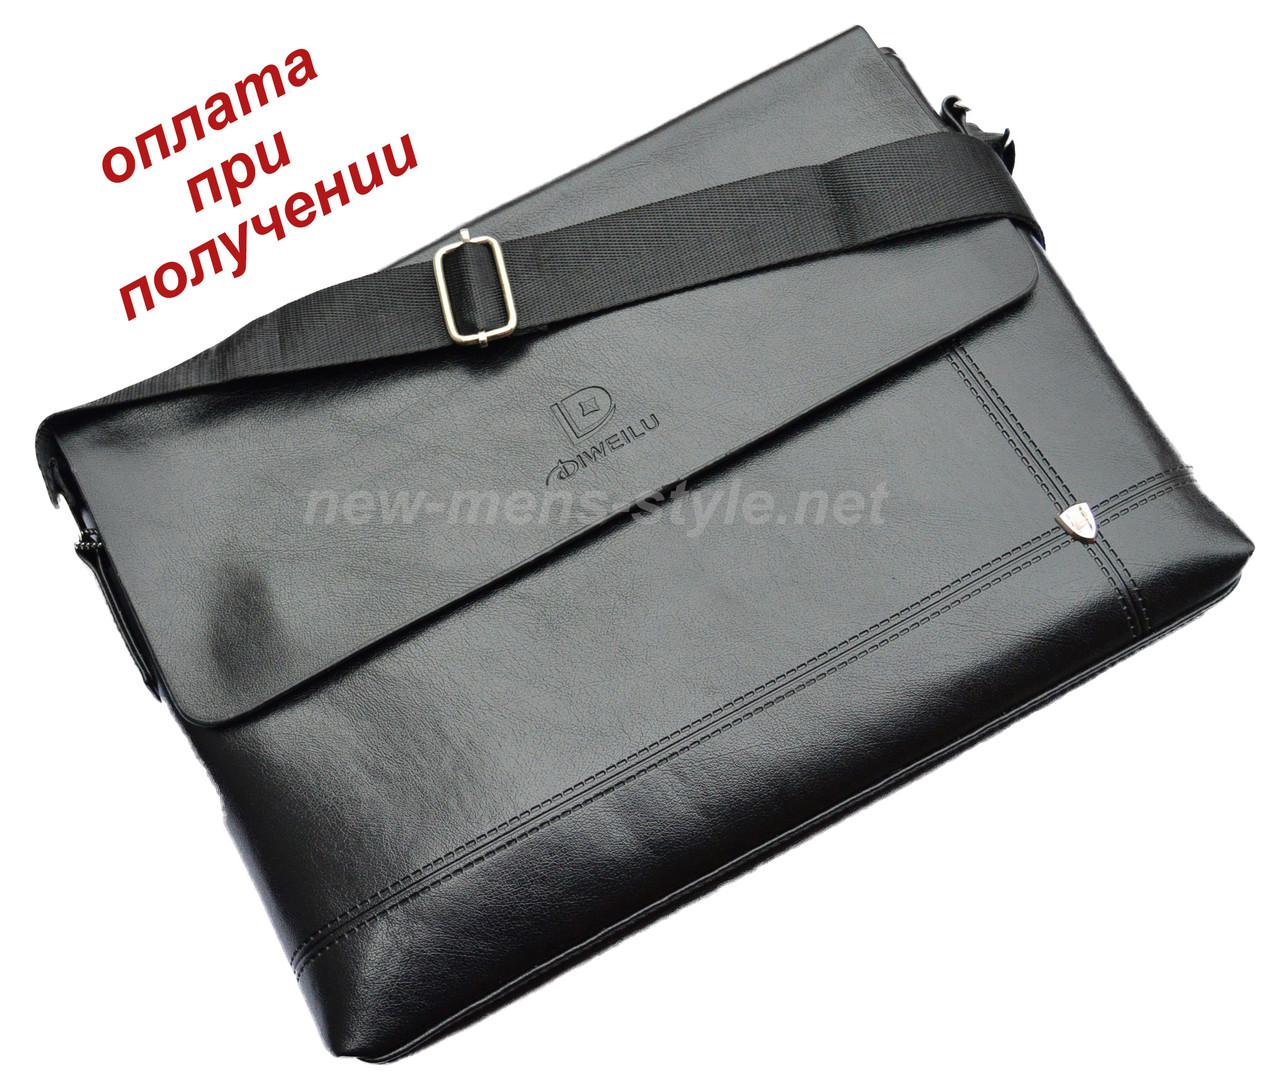 f79e0da56e23 Мужская чоловіча деловая кожаная сумка портфель формат А4 A4 ...